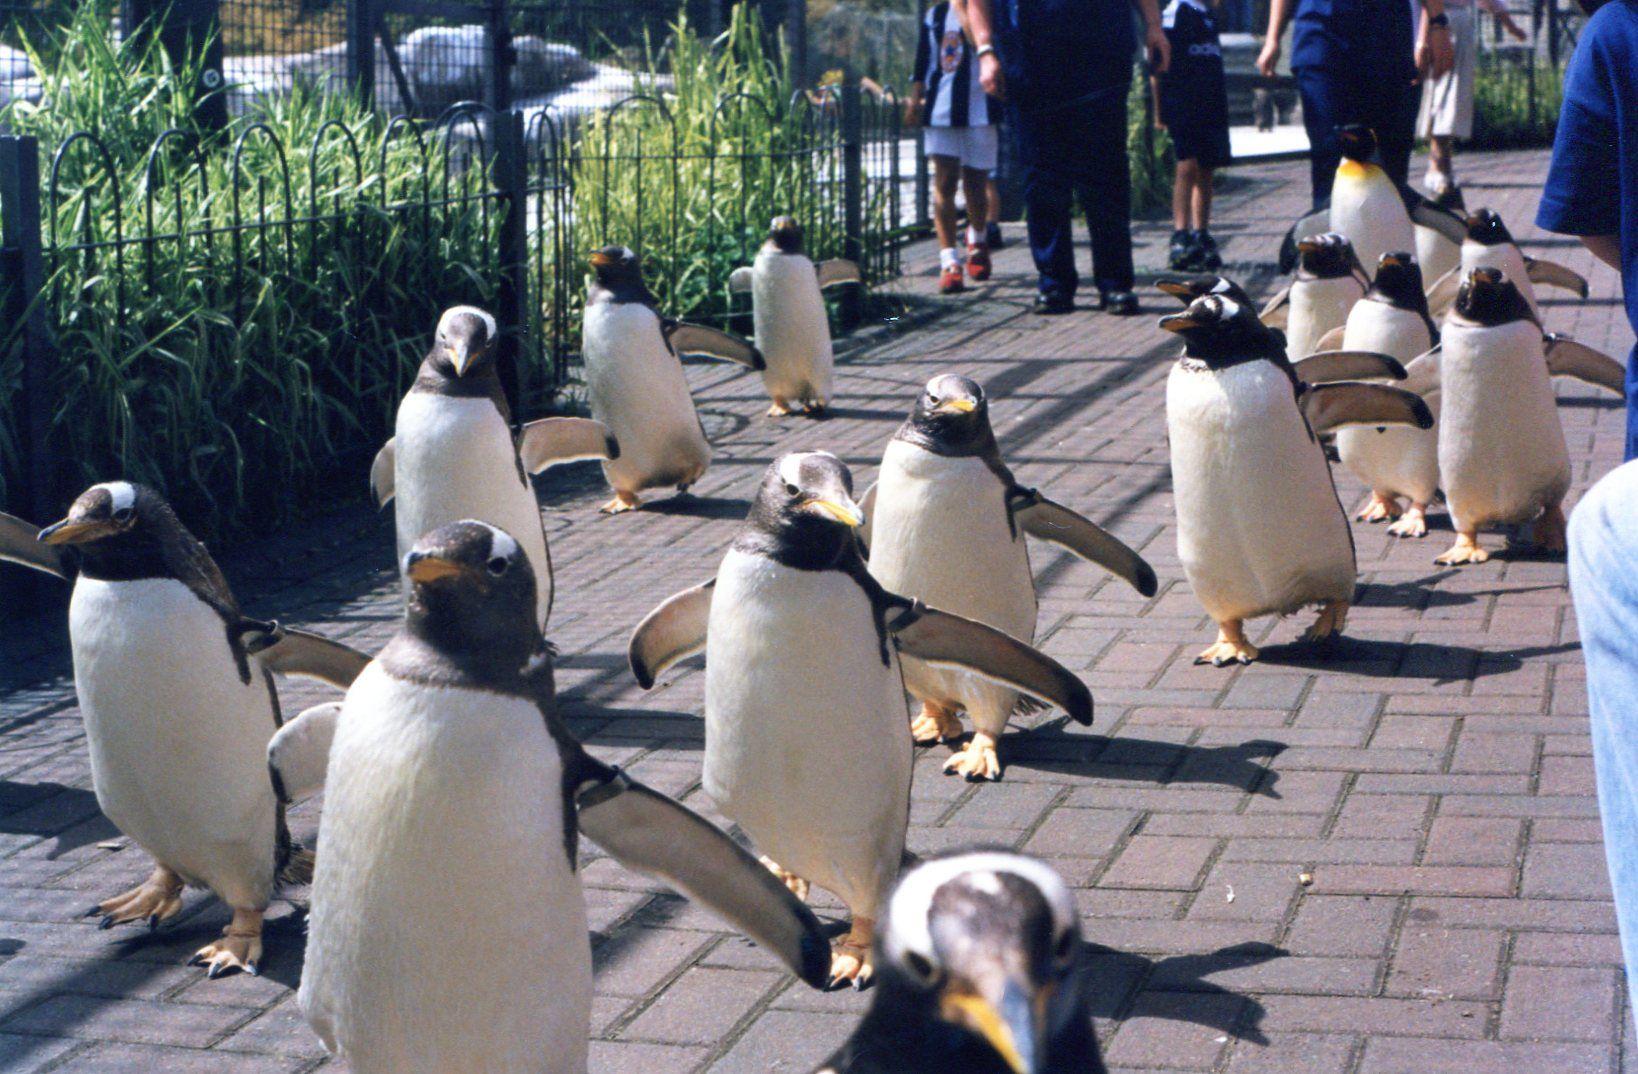 Penguin Parade At Edinburgh Zoo In Scotland Sooooooooo Going There Someday Edinburgh Zoo Days Out With Kids Penguin Parade